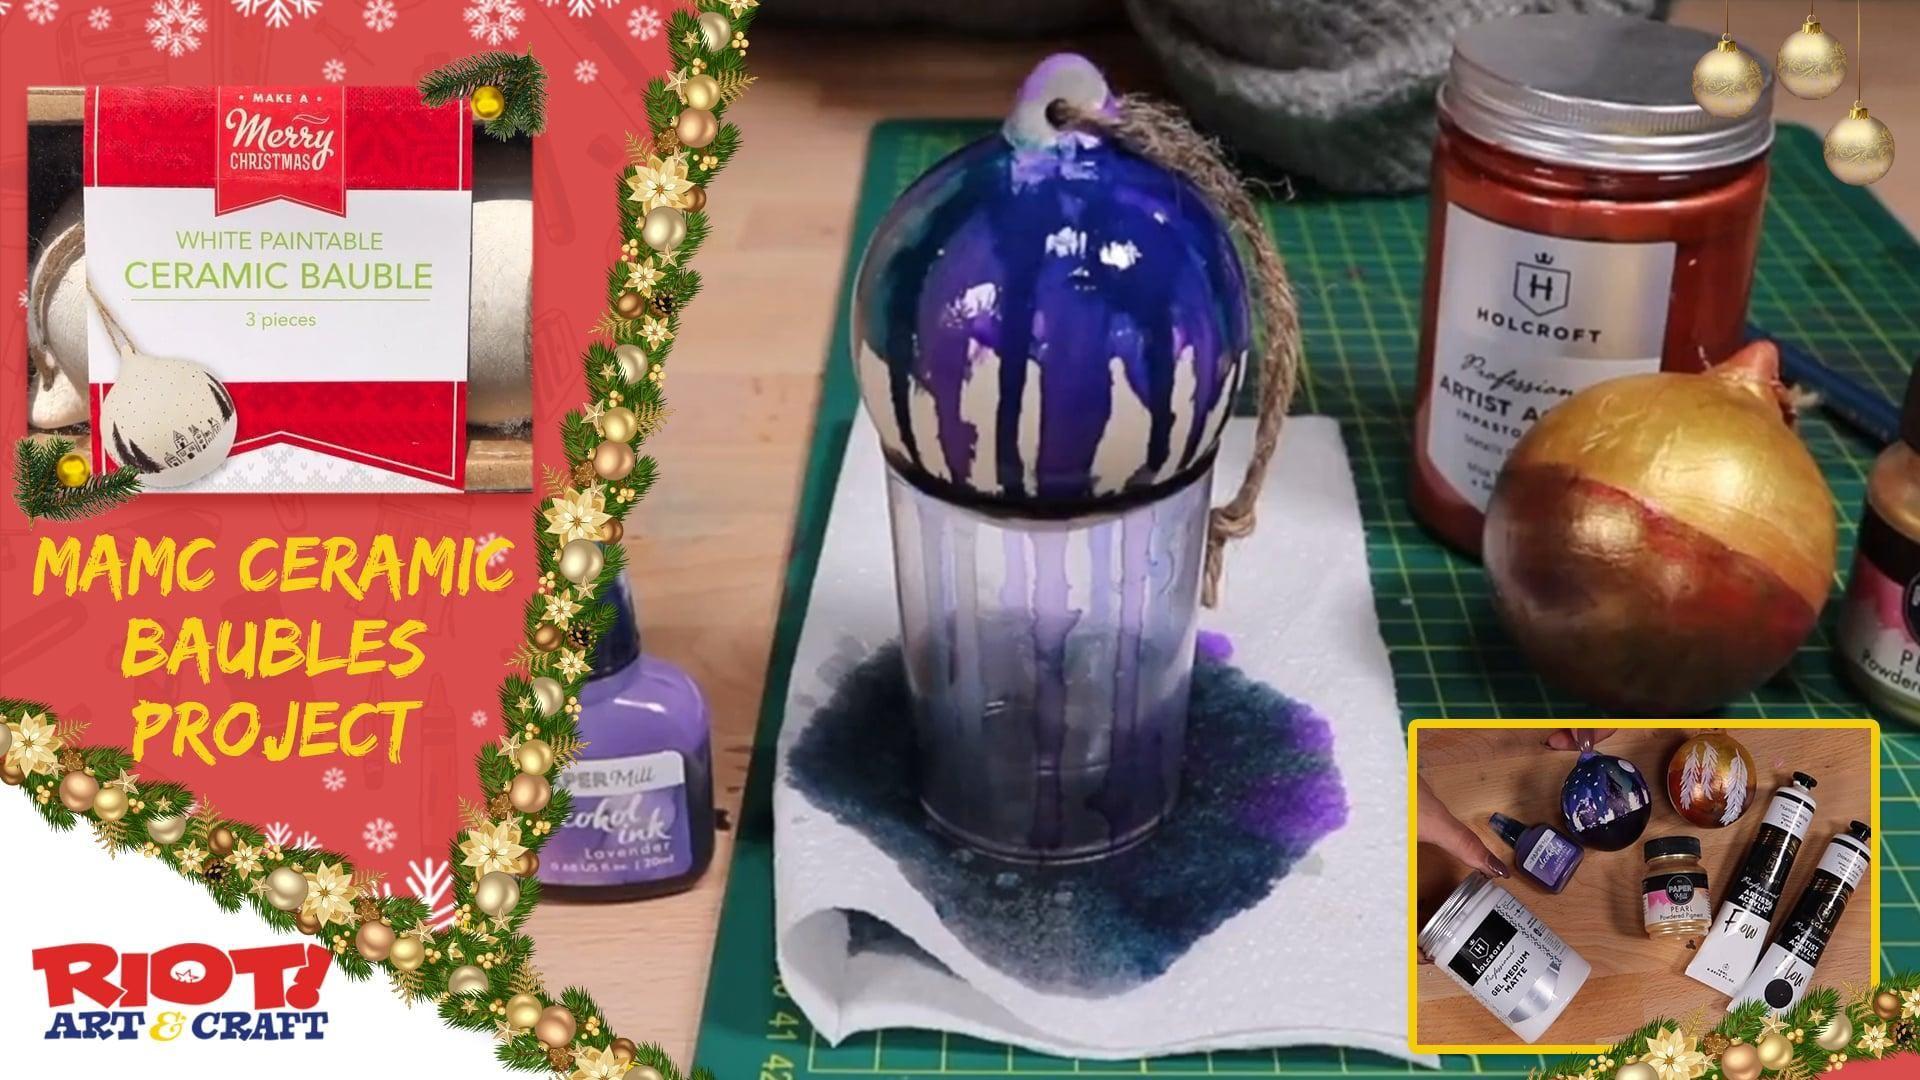 MAMC  Ceramic Baubles Project